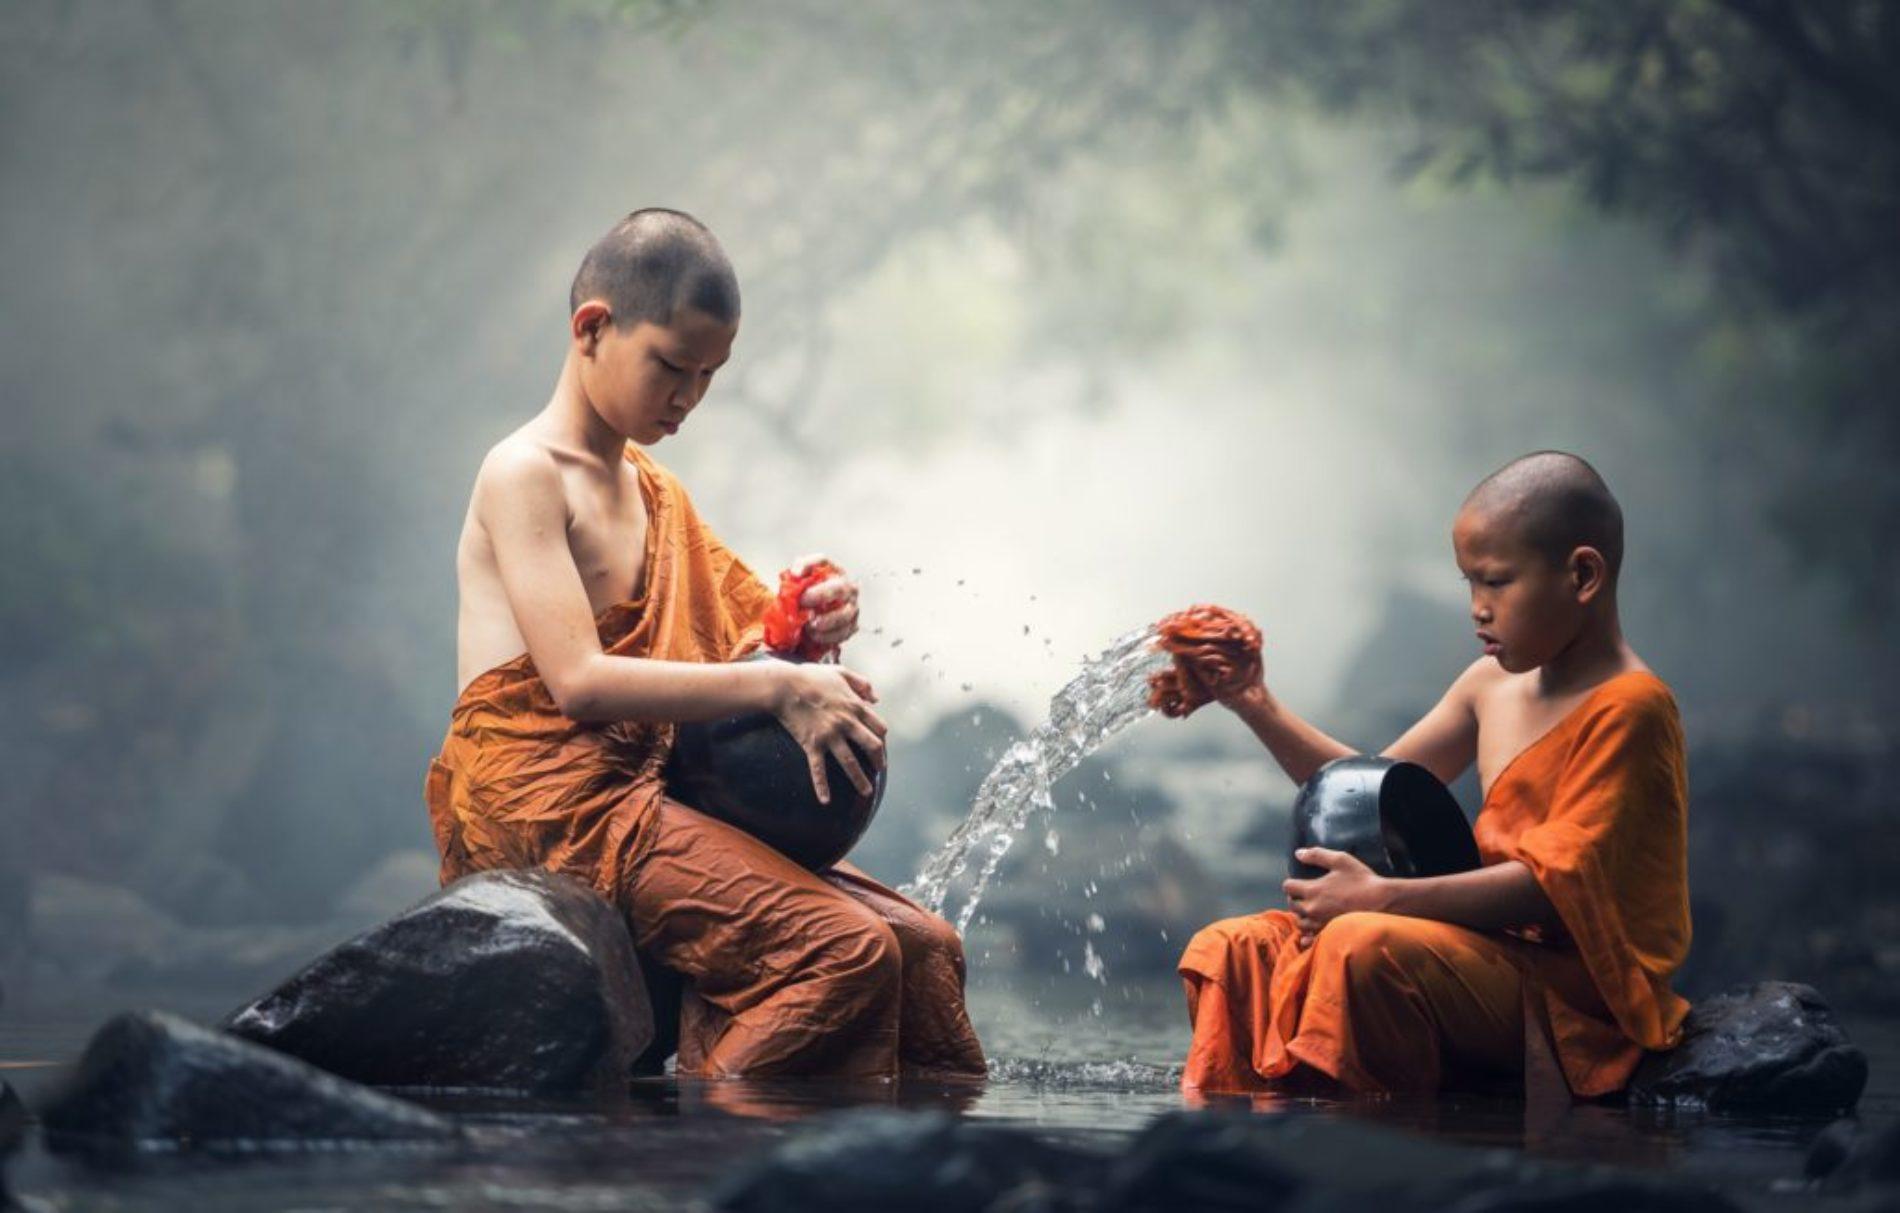 Сангха как сообщество духовных друзей на Пути — Ургьен Сангхаракшита